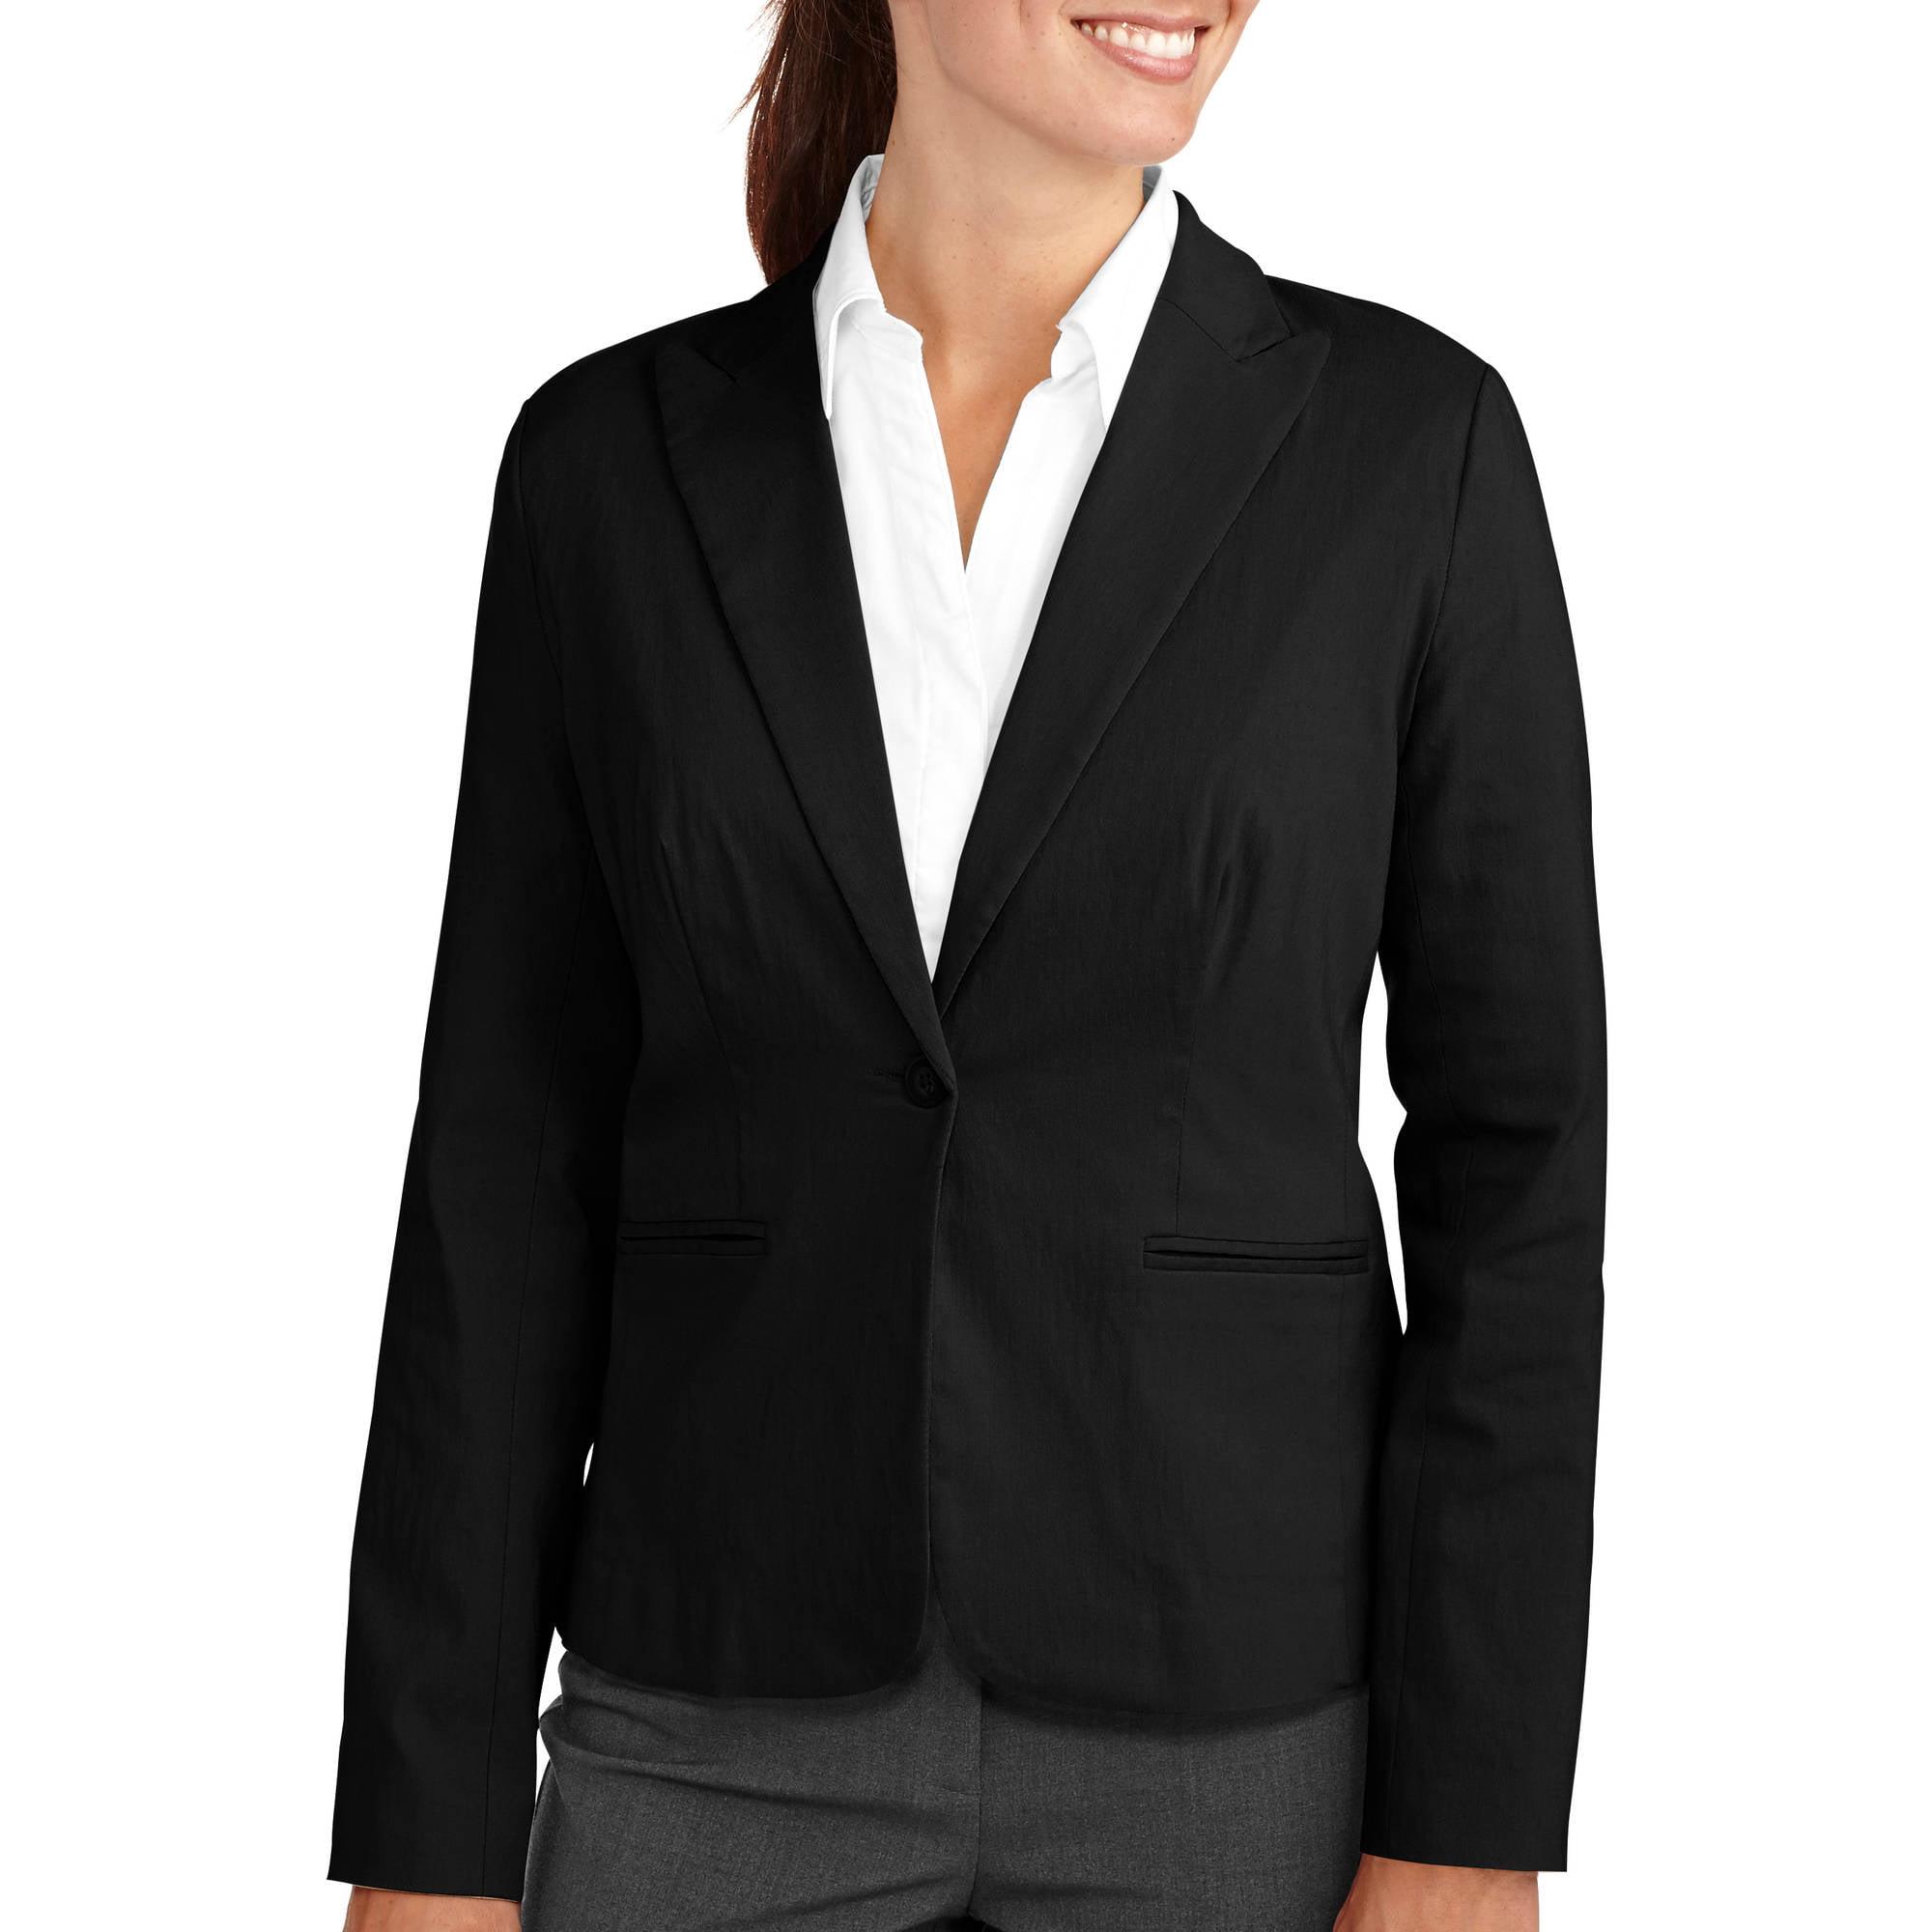 Women's Millennium Suiting Jacket